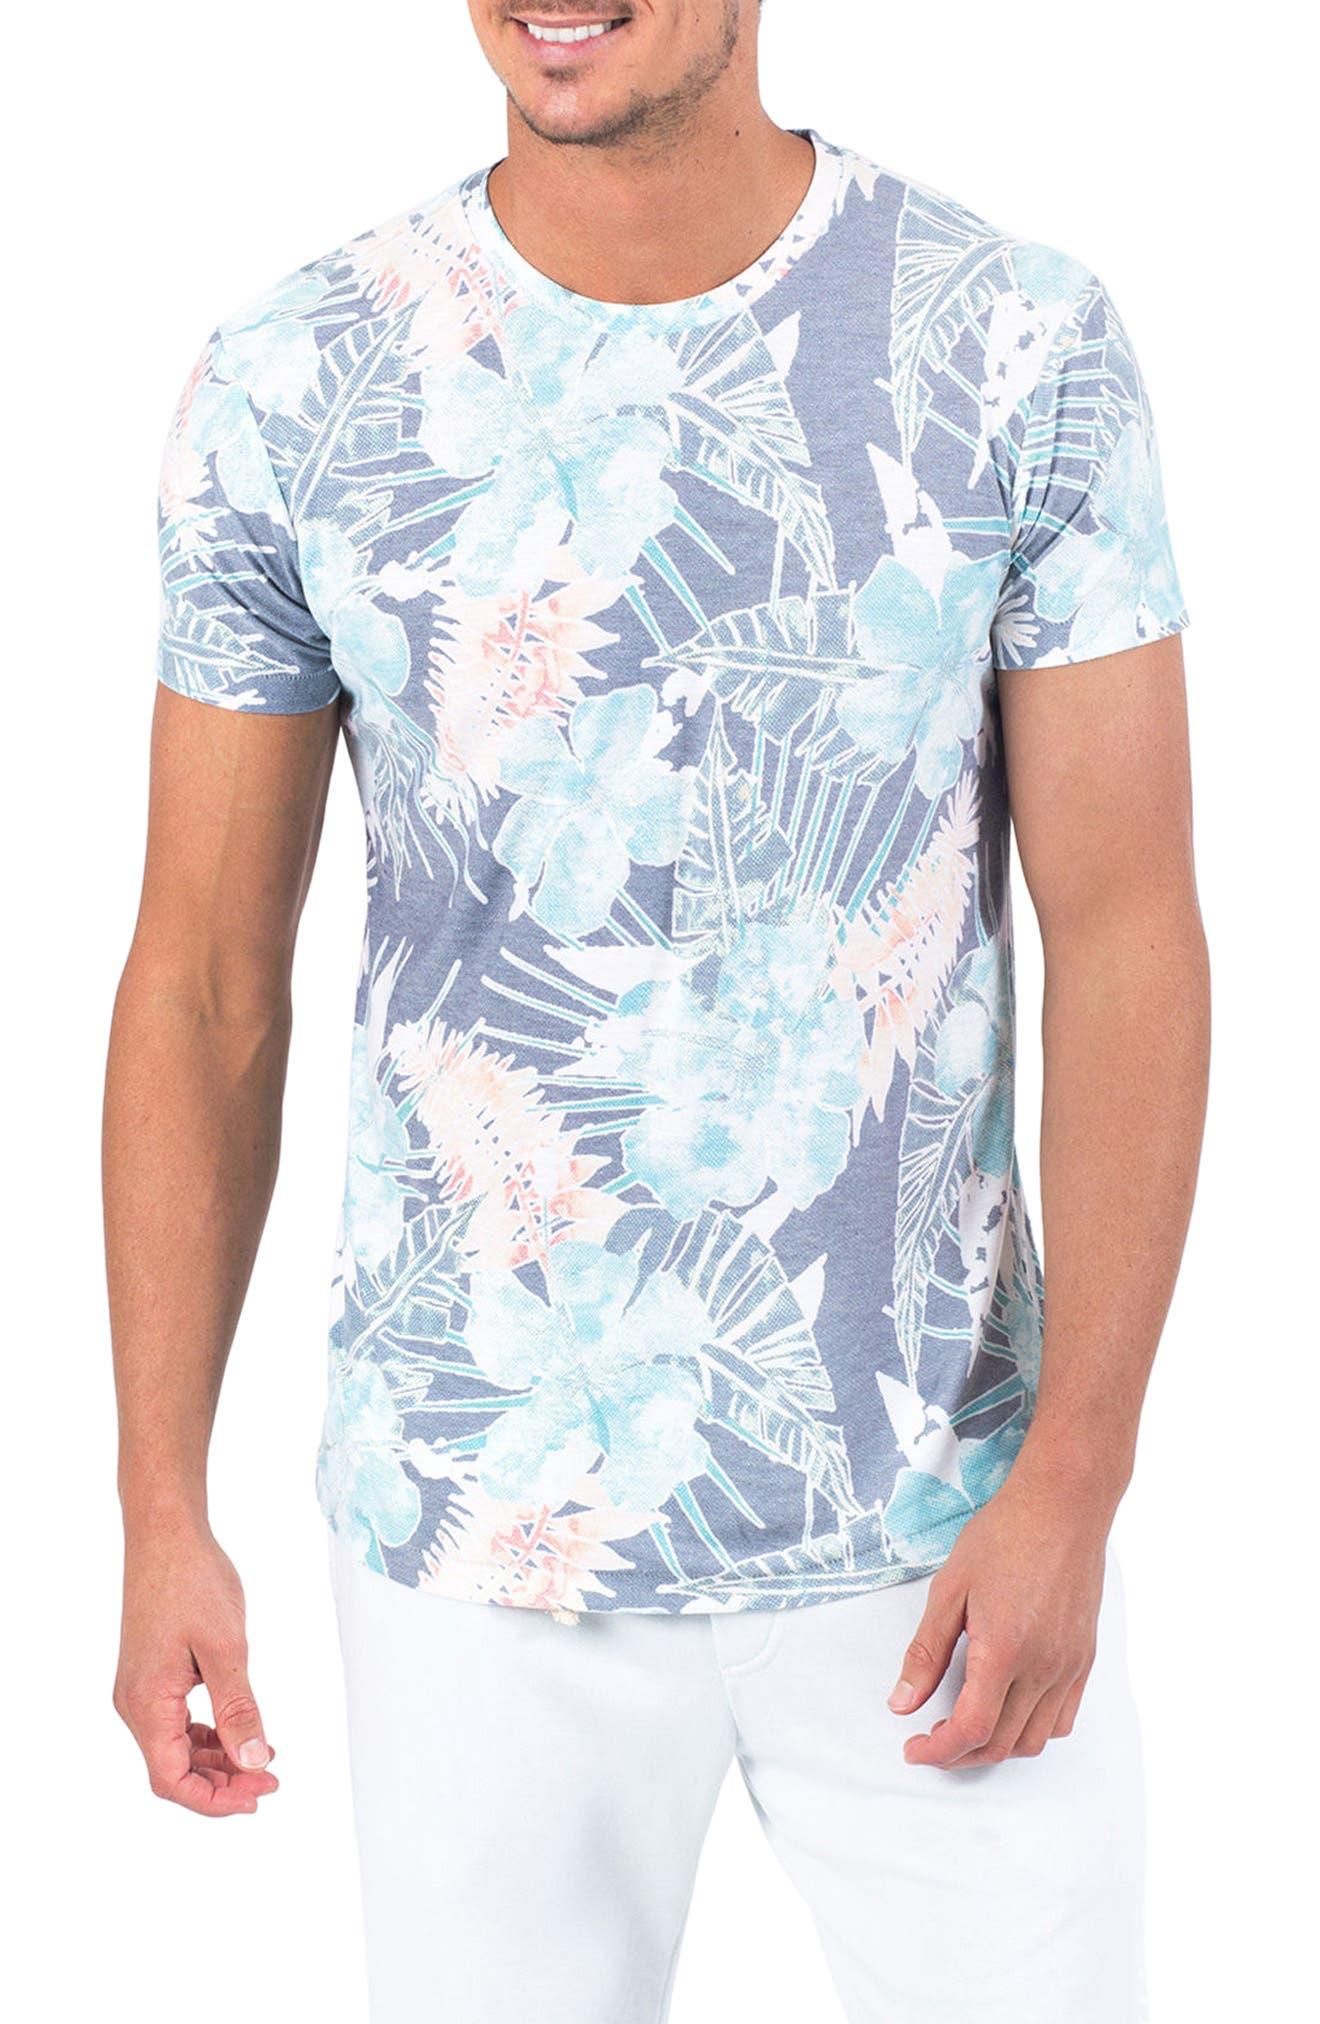 Botanica Verde T-Shirt,                             Main thumbnail 1, color,                             100